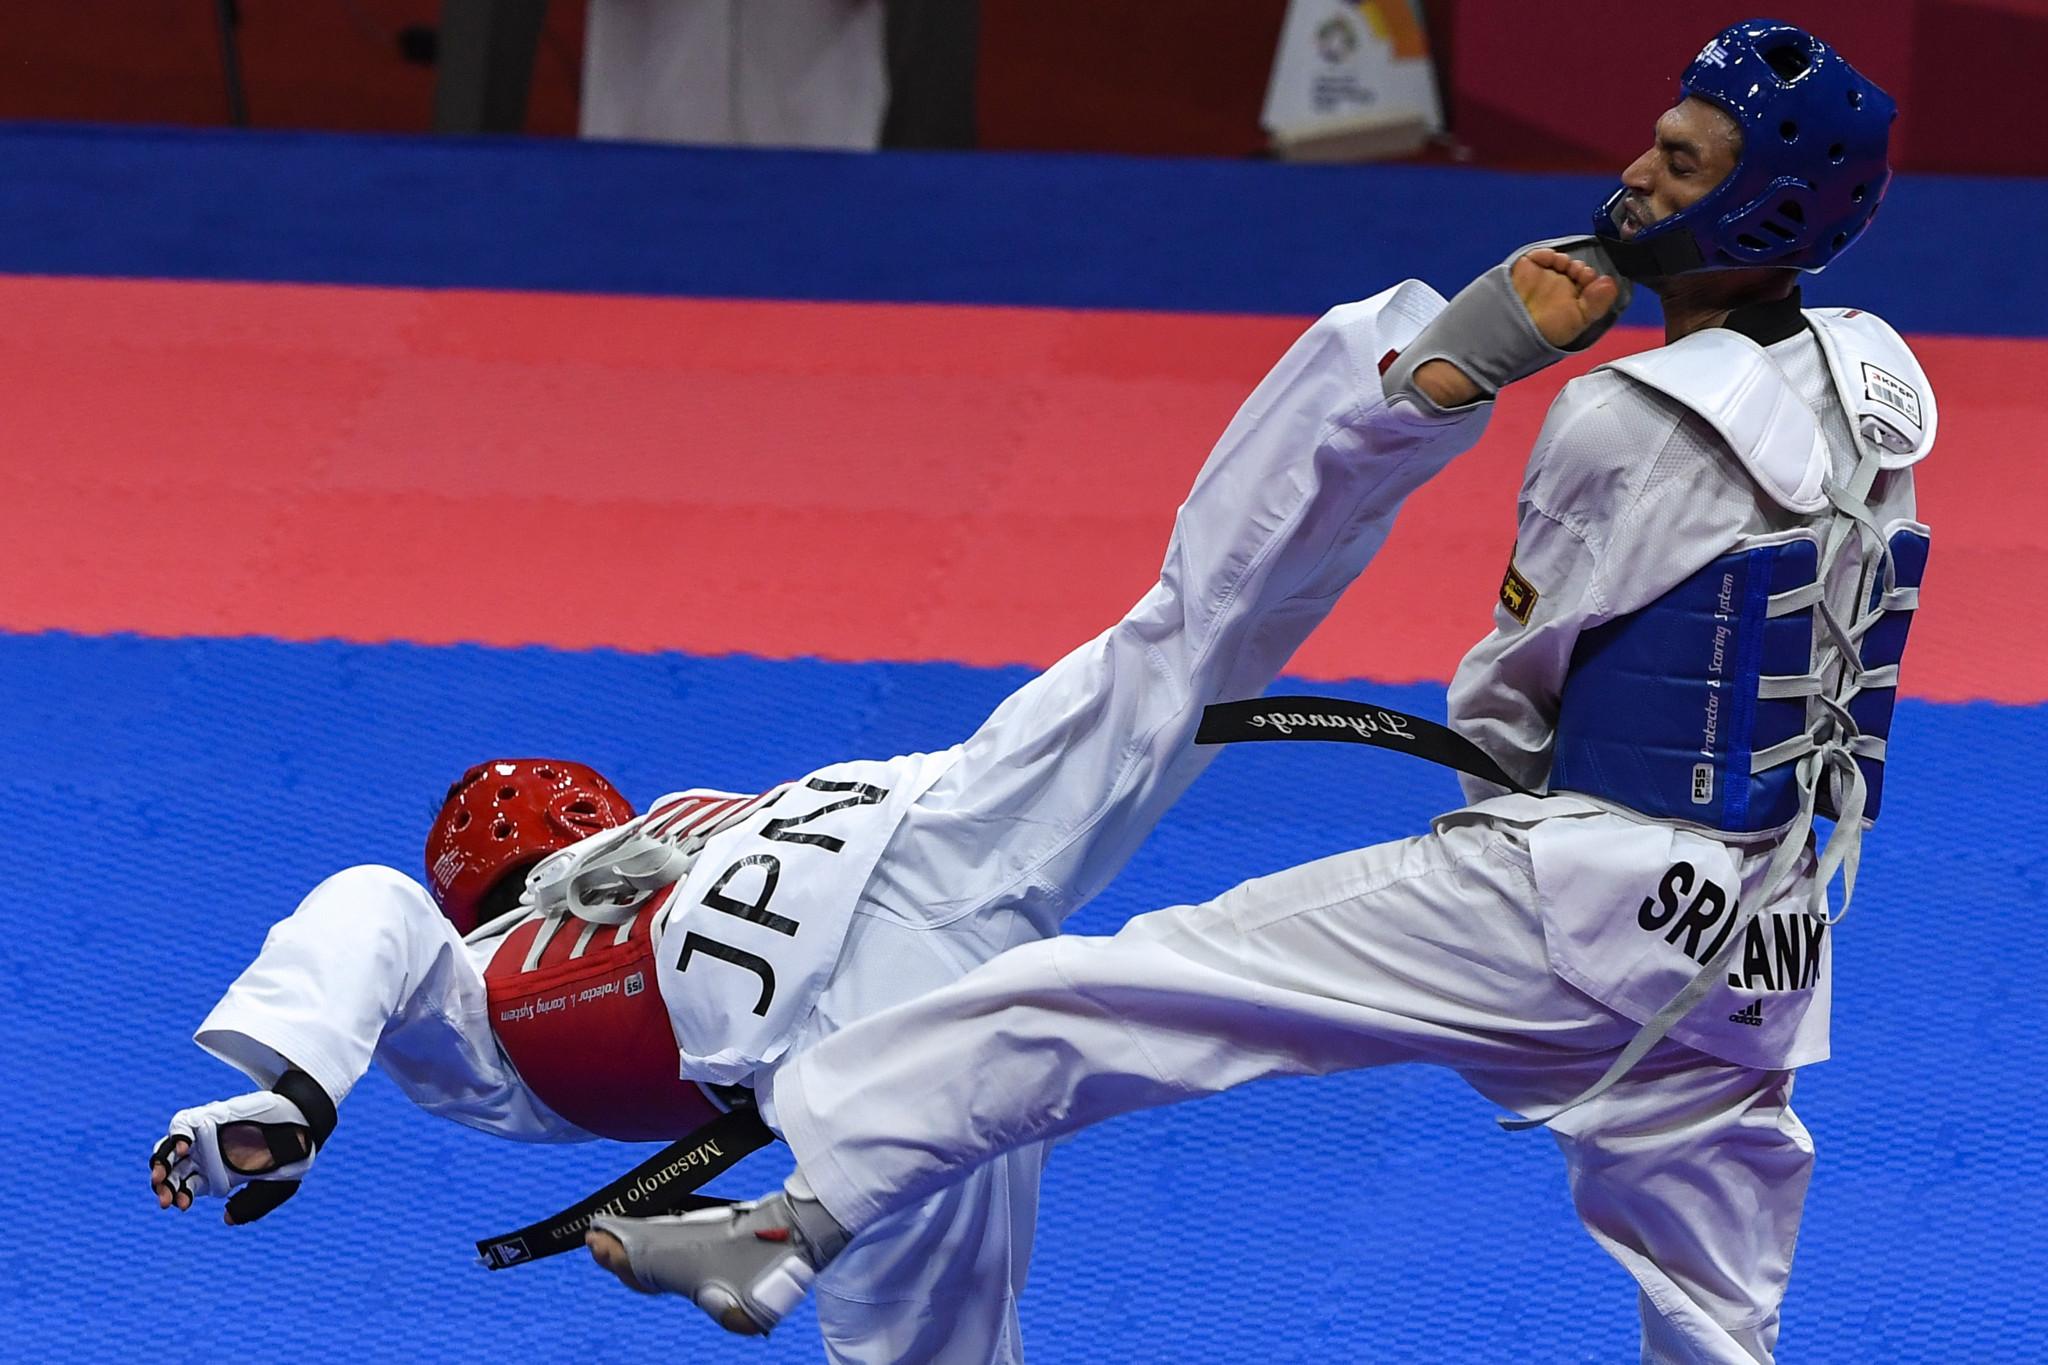 Sri Lankan taekwondo players urged to target Olympic success as South Asian Games medallists honoured